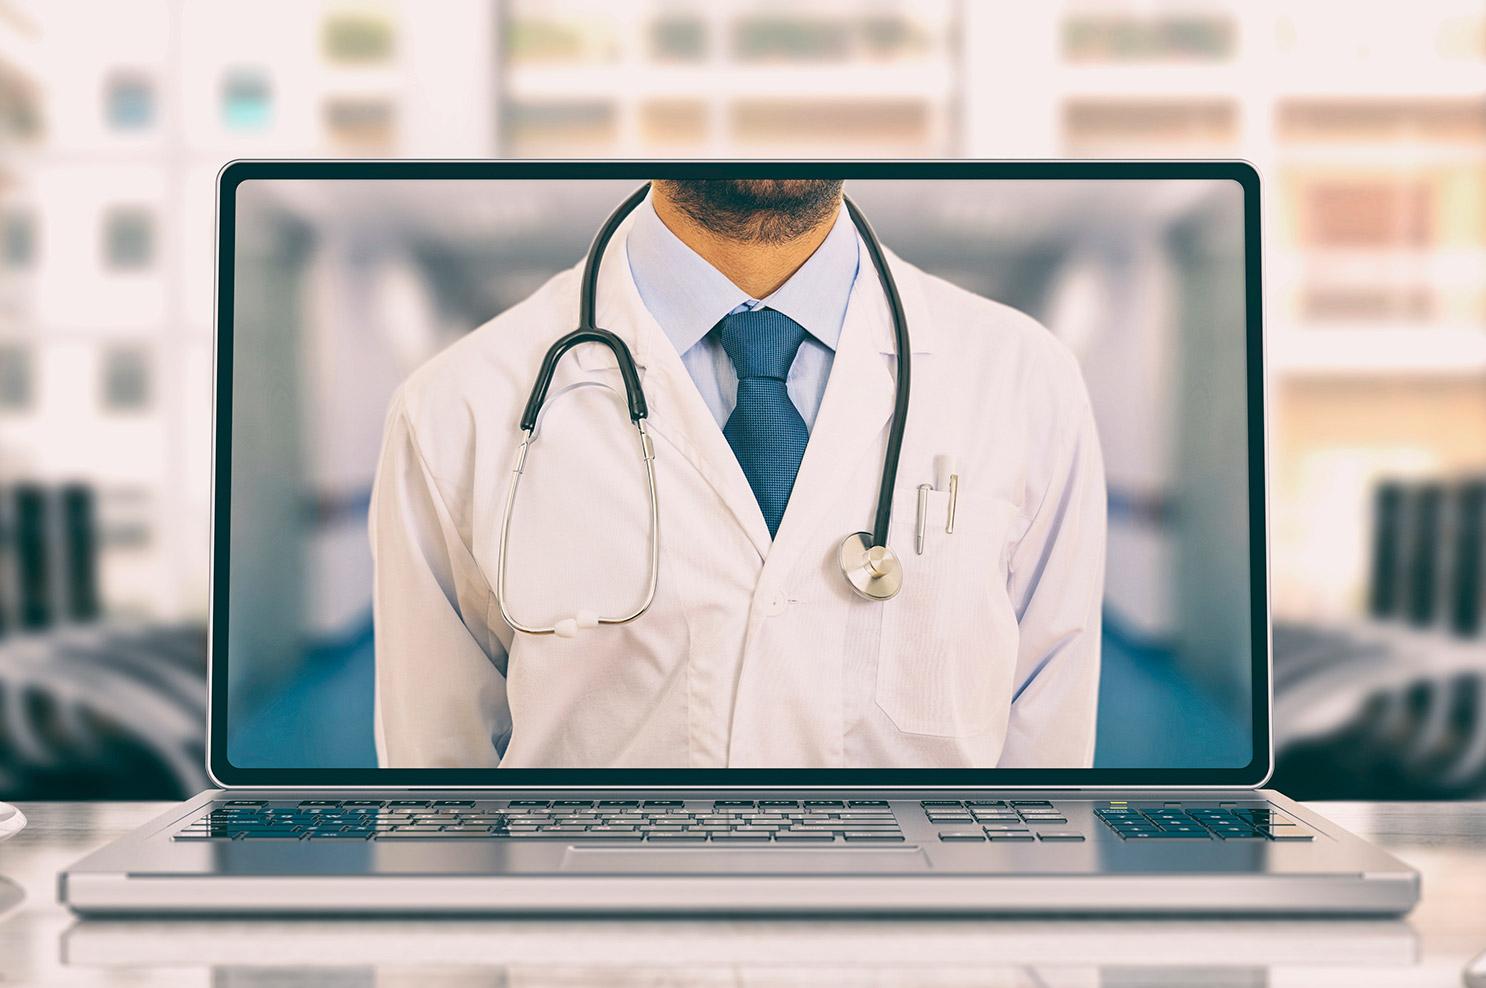 Doctor consultando a distancia gracias a la telemedicina